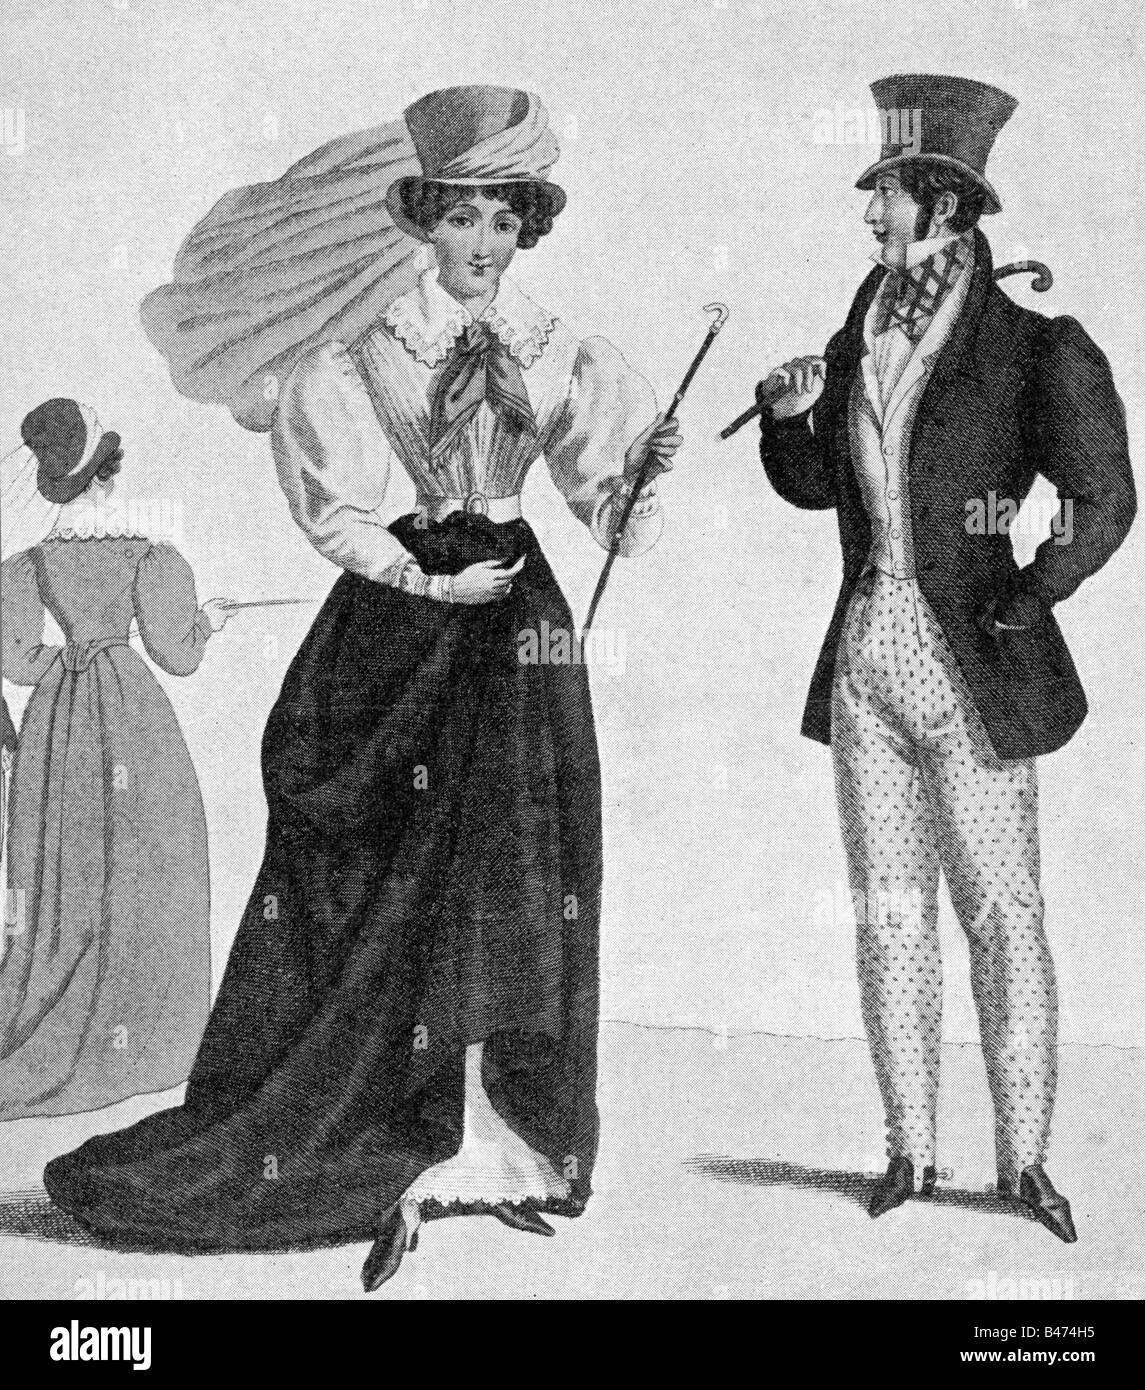 Early Th Century Mens Fashion